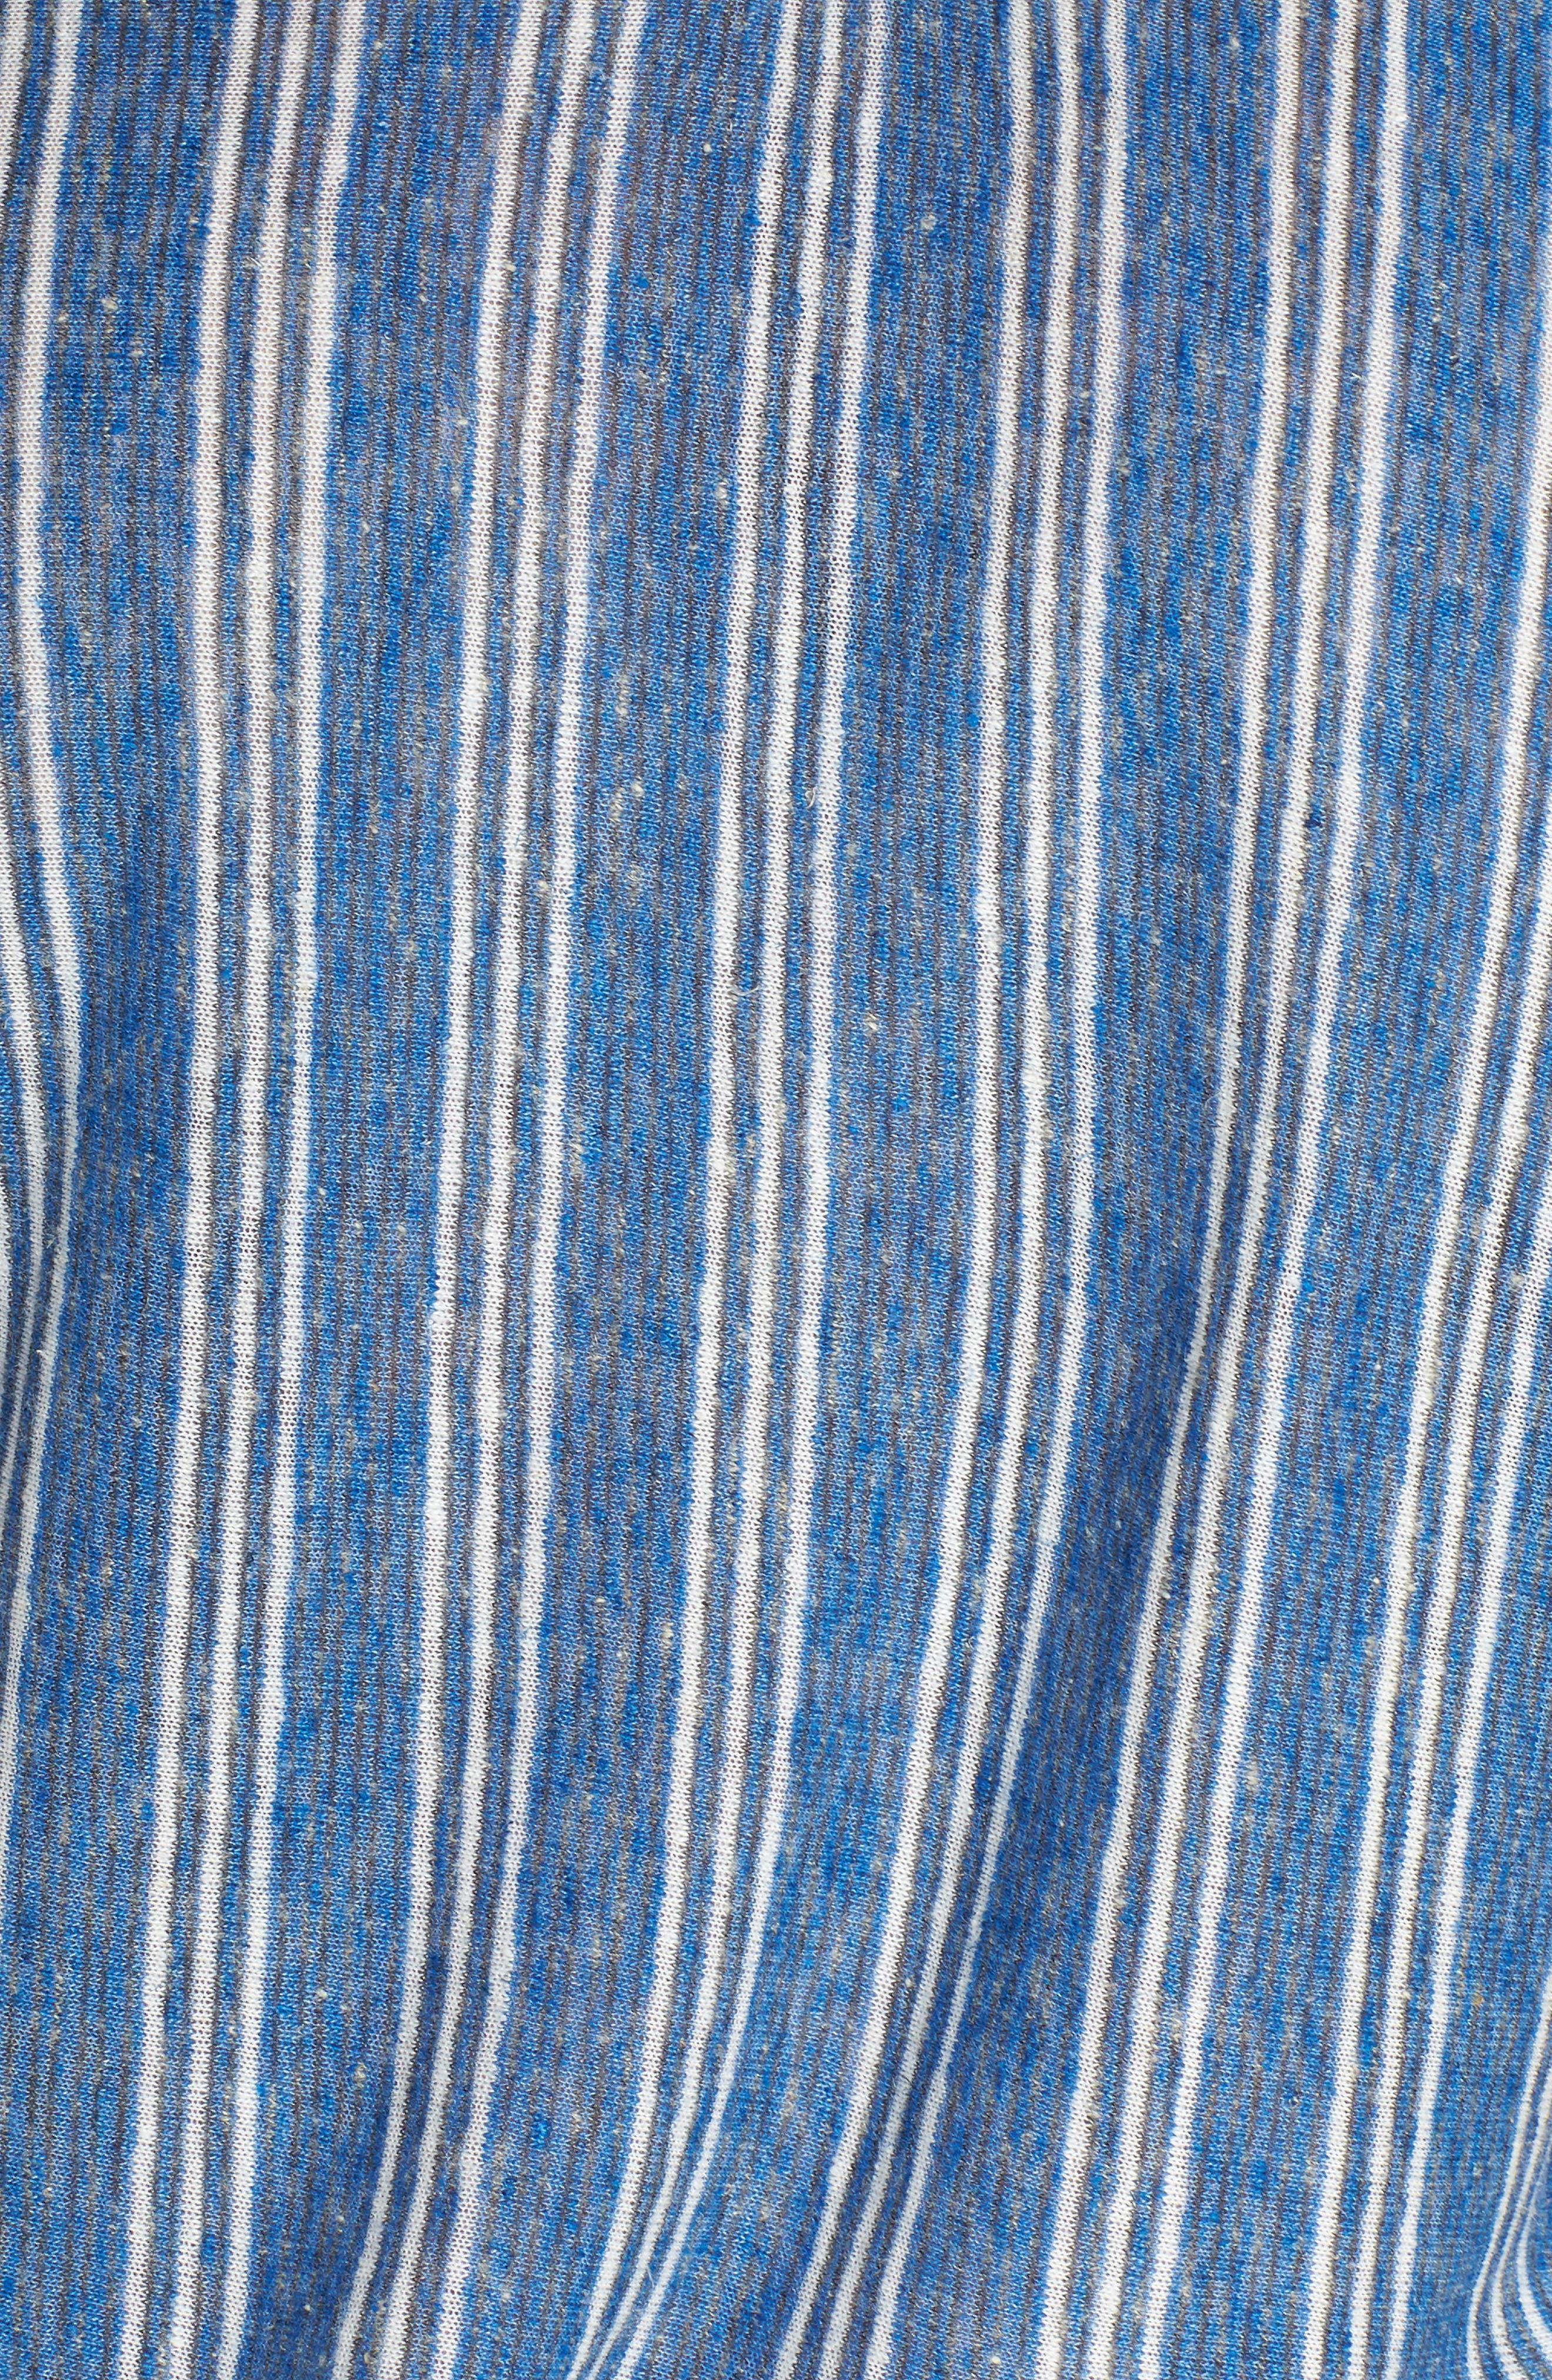 Stripe Tie Shoulder Linen Blend Tee,                             Alternate thumbnail 6, color,                             460